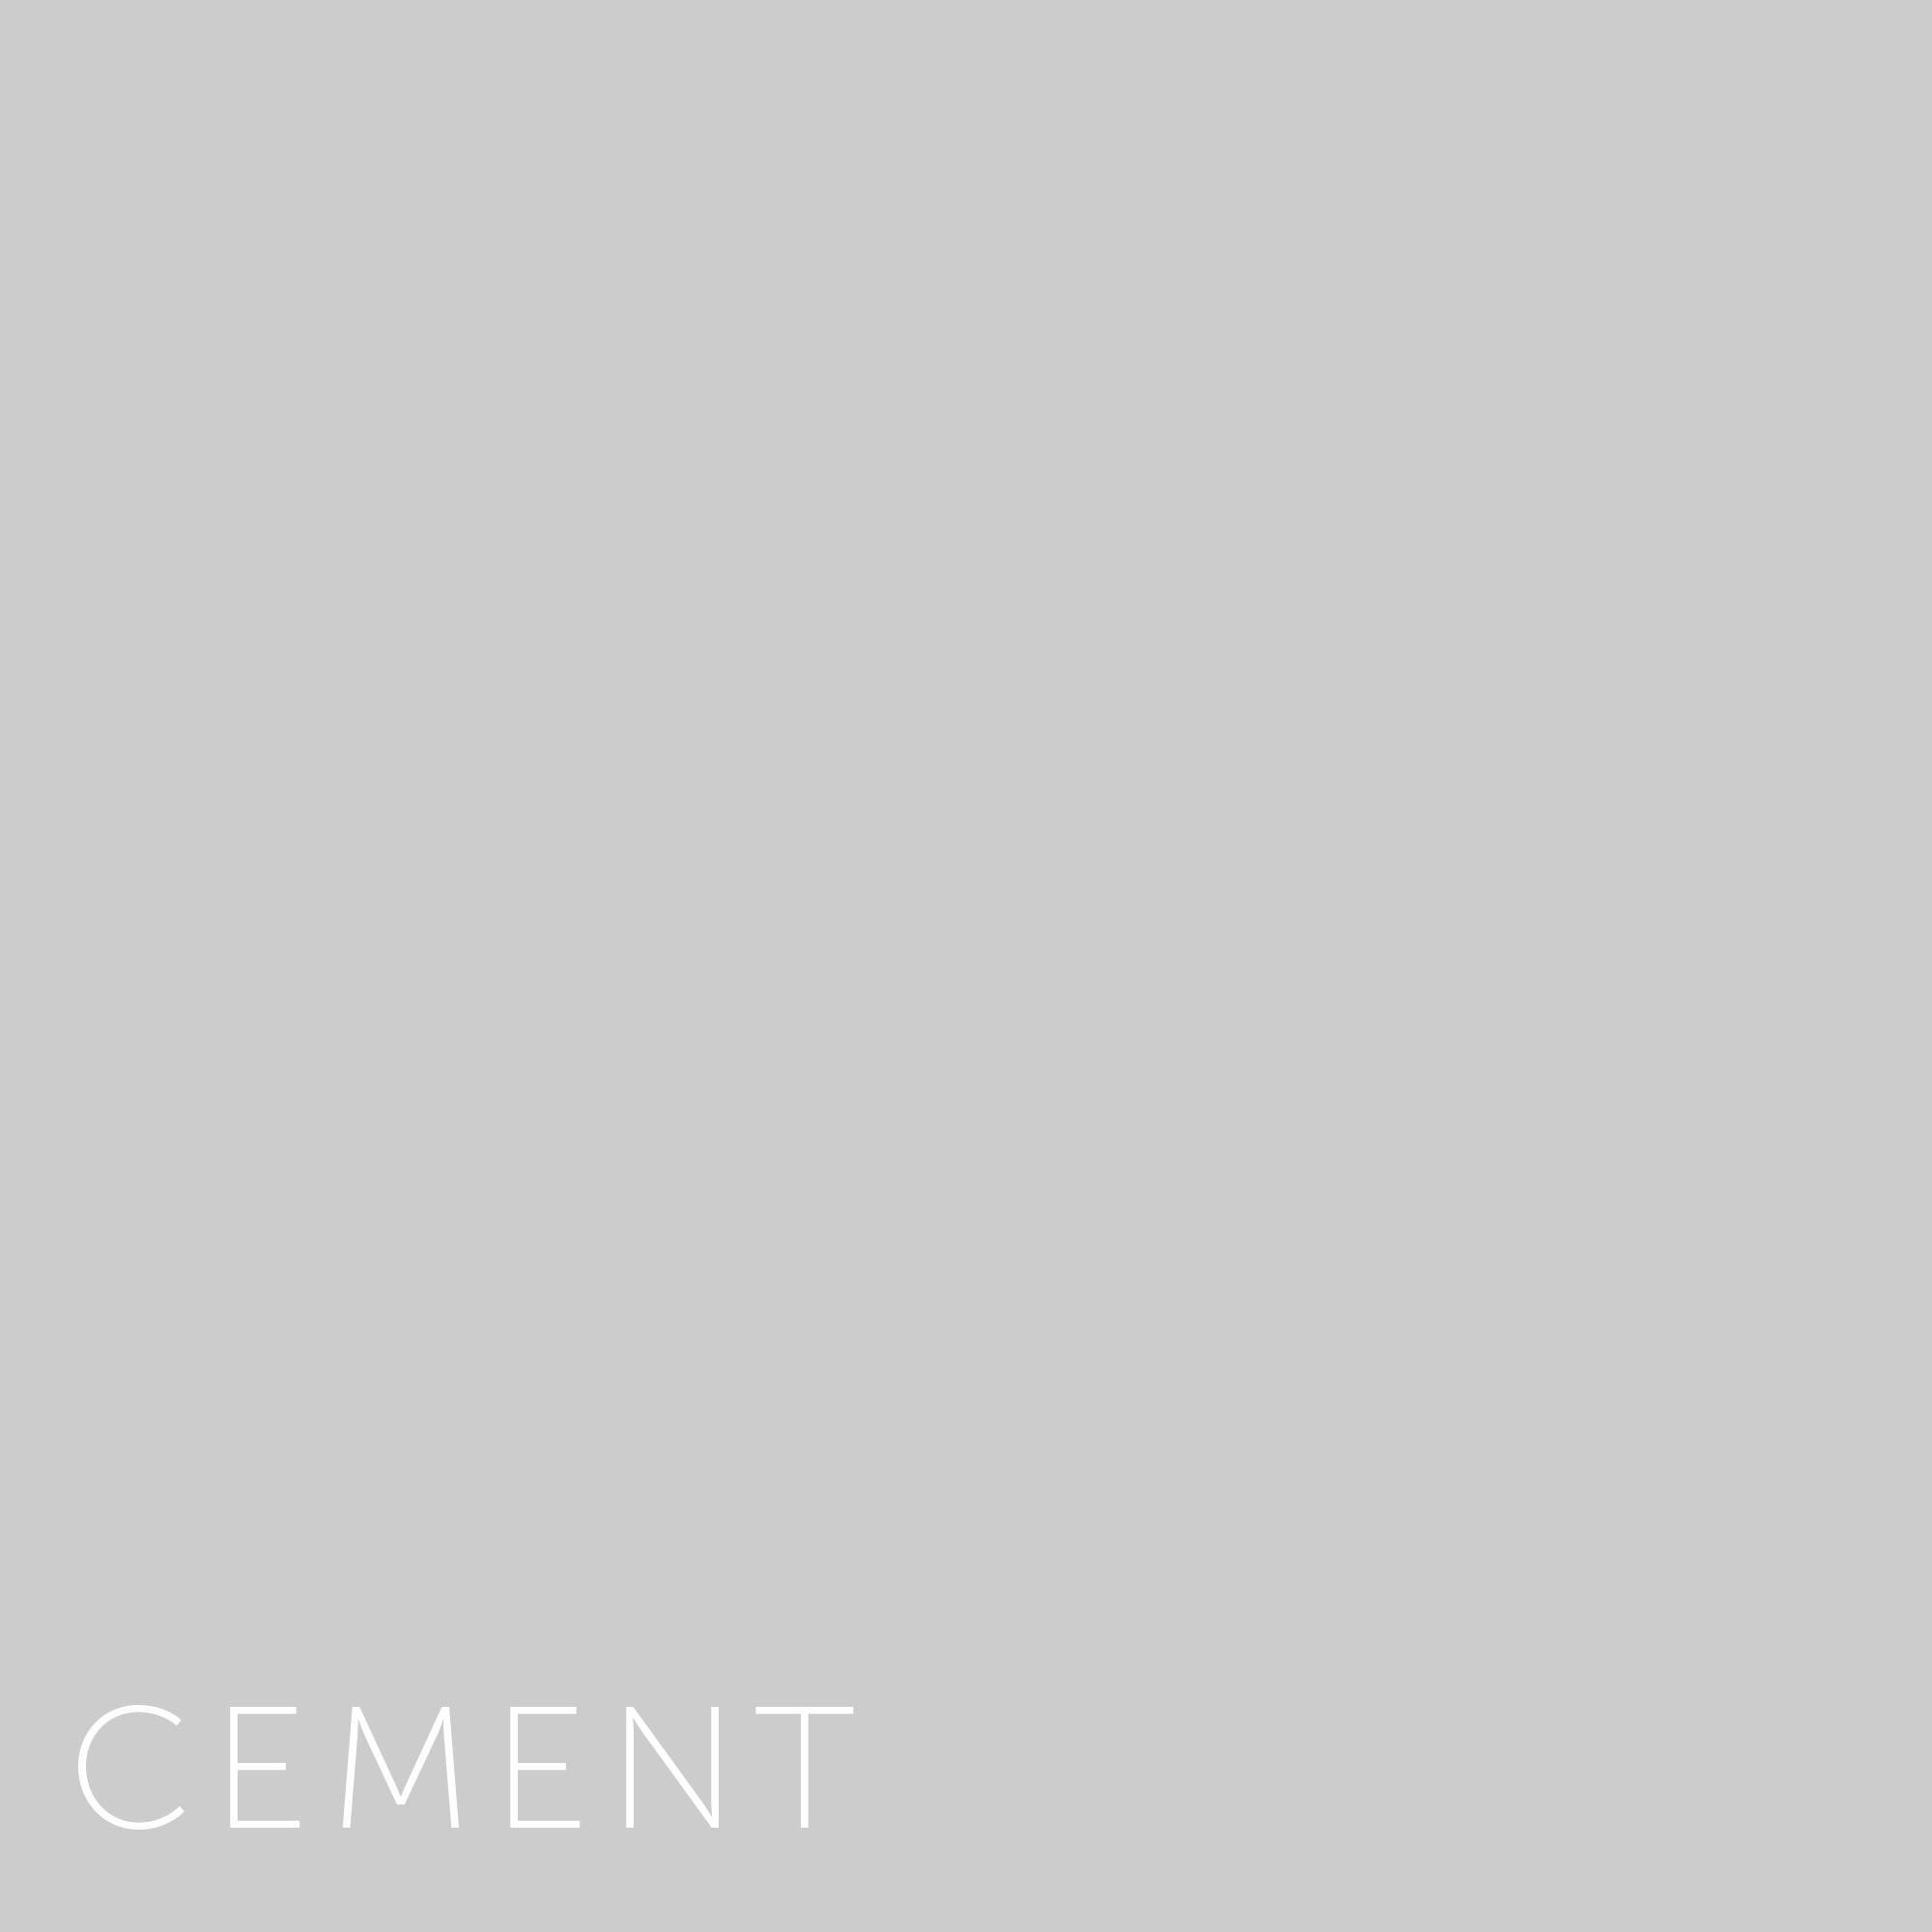 Zeer Verf - Kleurstaal 19x19 Cement   Home Made By NW72